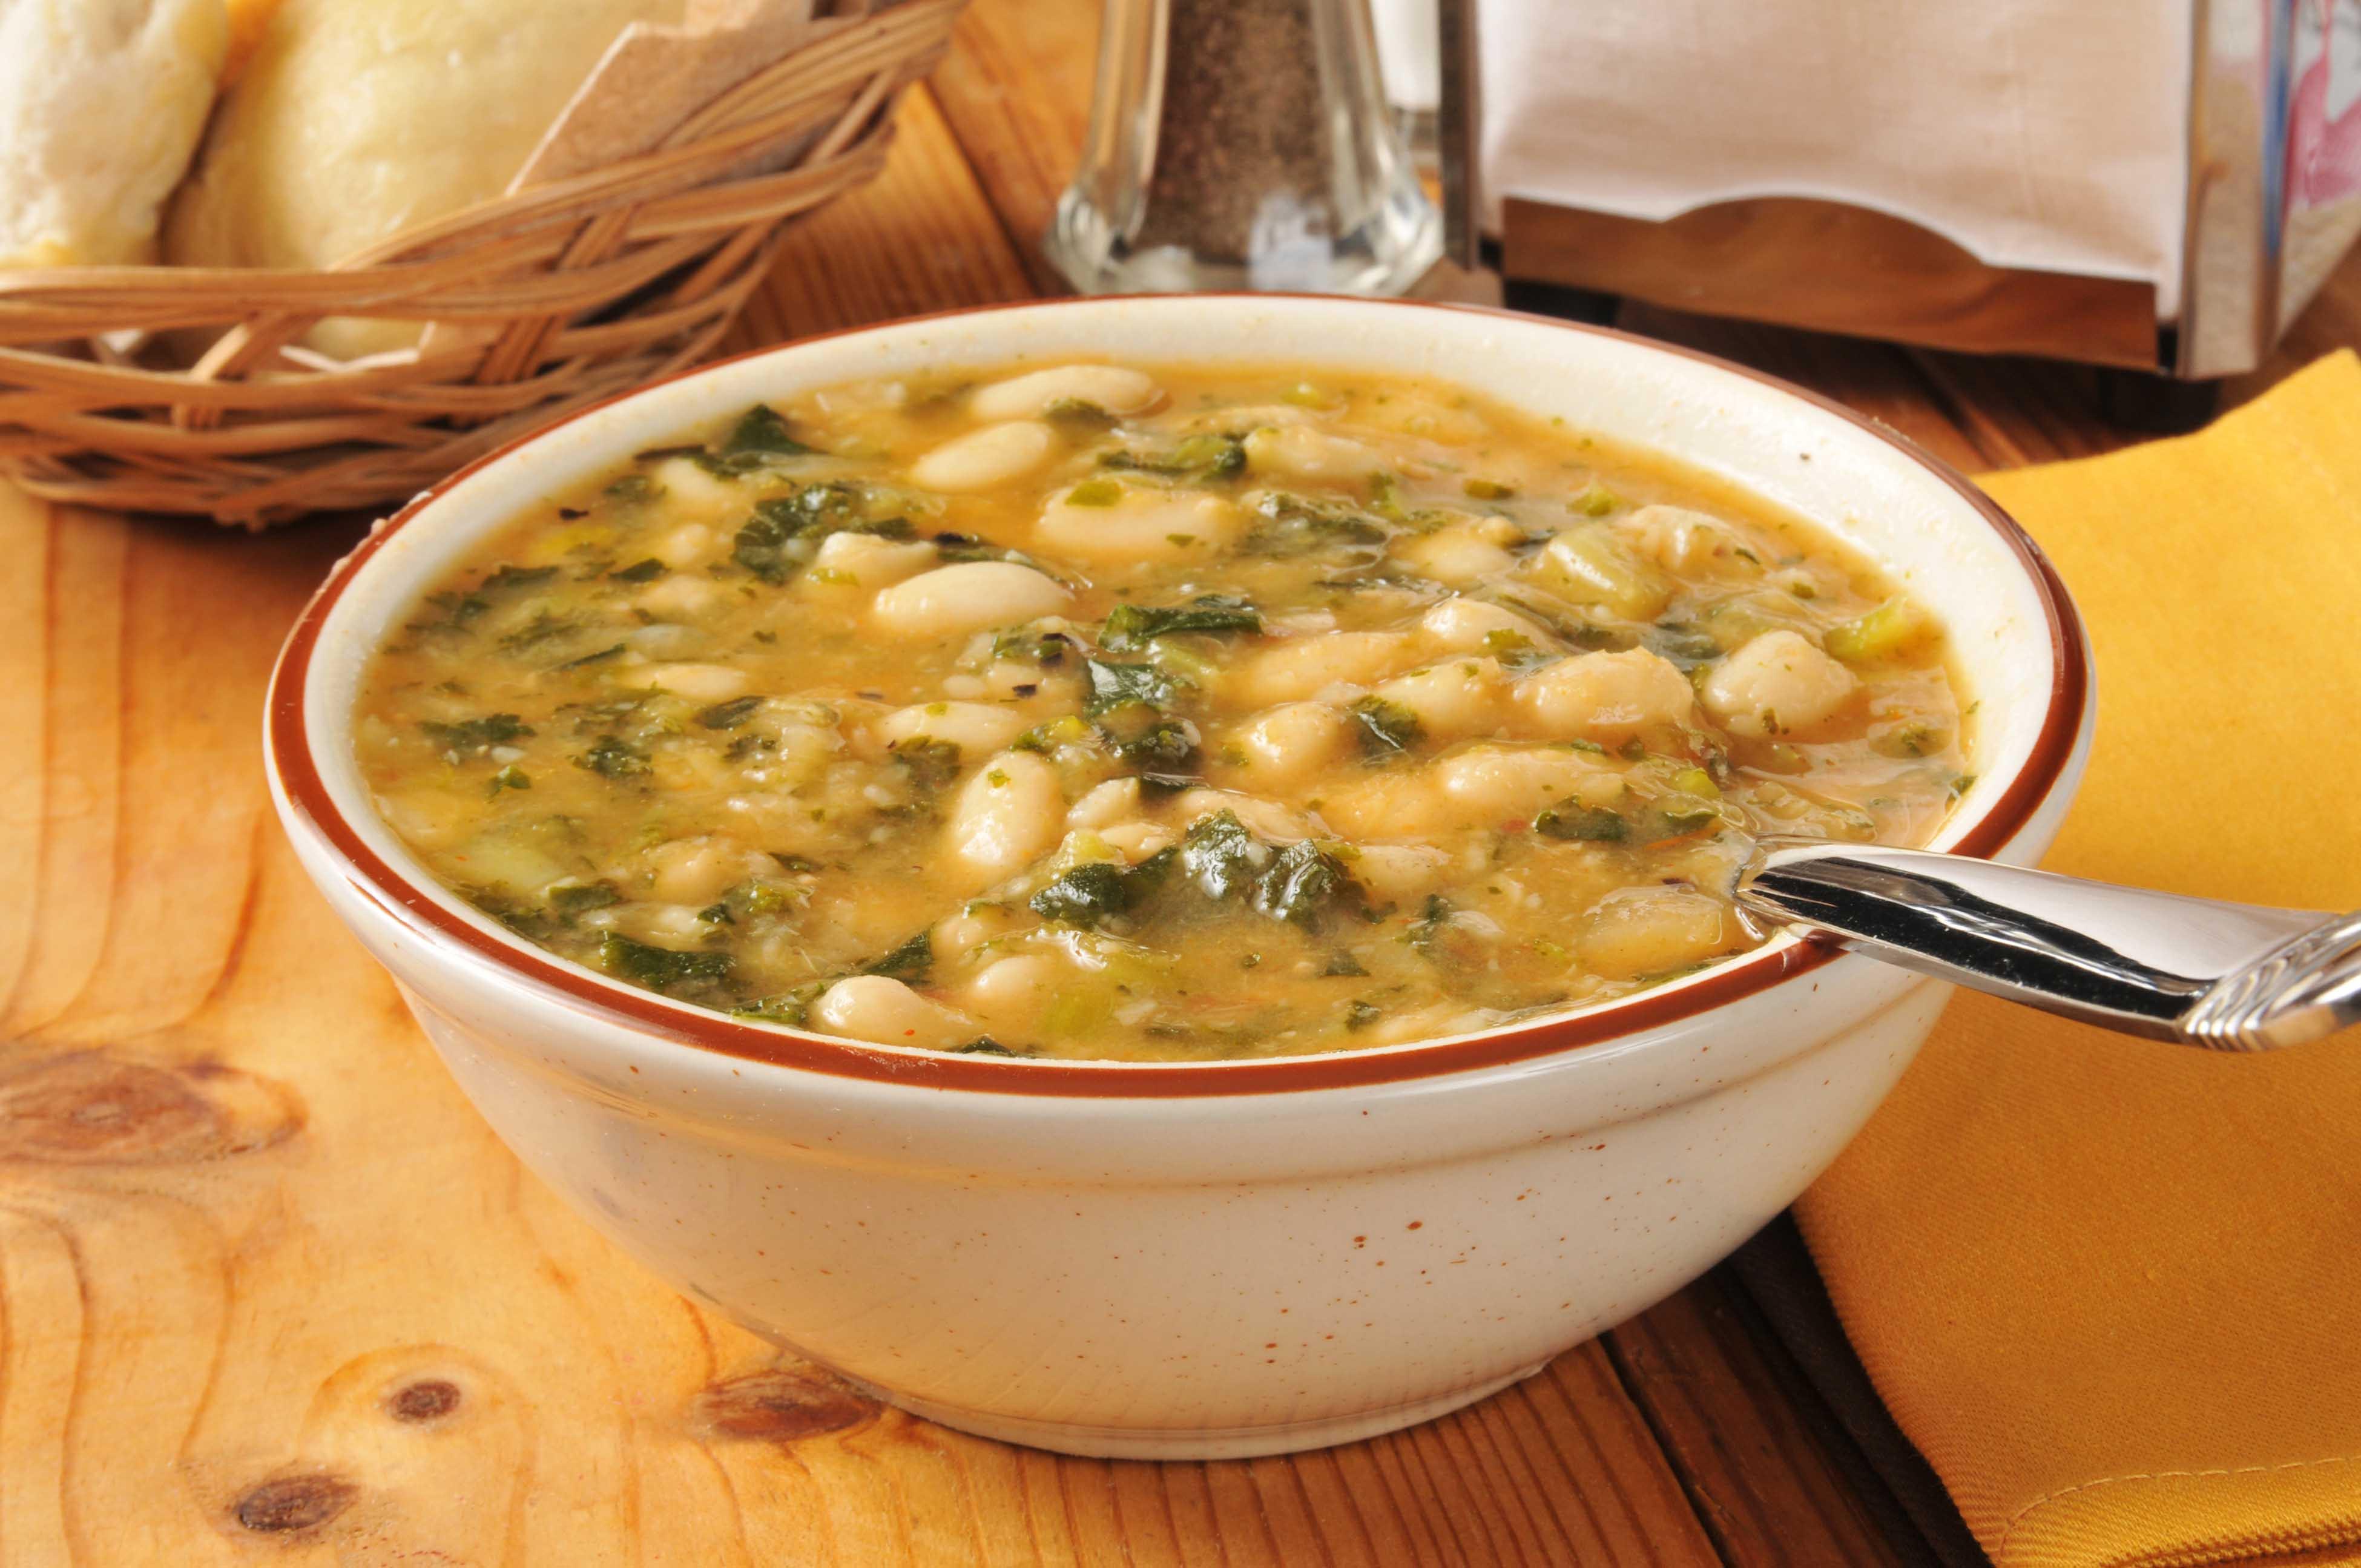 White Bean Recipes Healthy  Healthy Recipe White Bean and Kale Soup